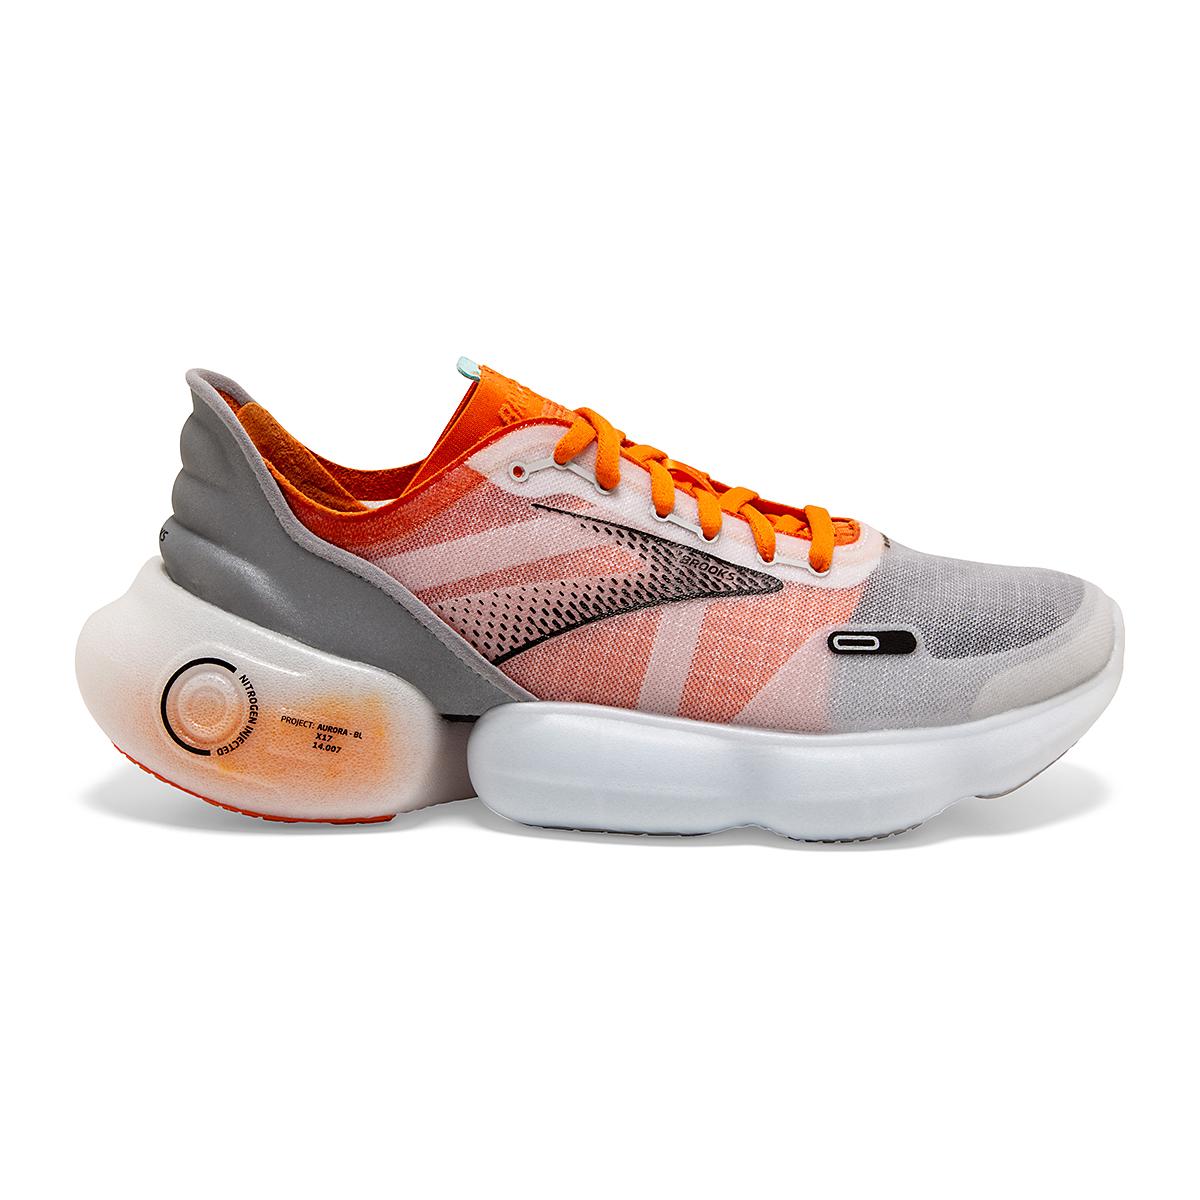 Men's Brooks Aurora-BL Running Shoe - Color: Persimmon/Antarctica - Size: 7 - Width: Regular, Persimmon/Antarctica, large, image 1